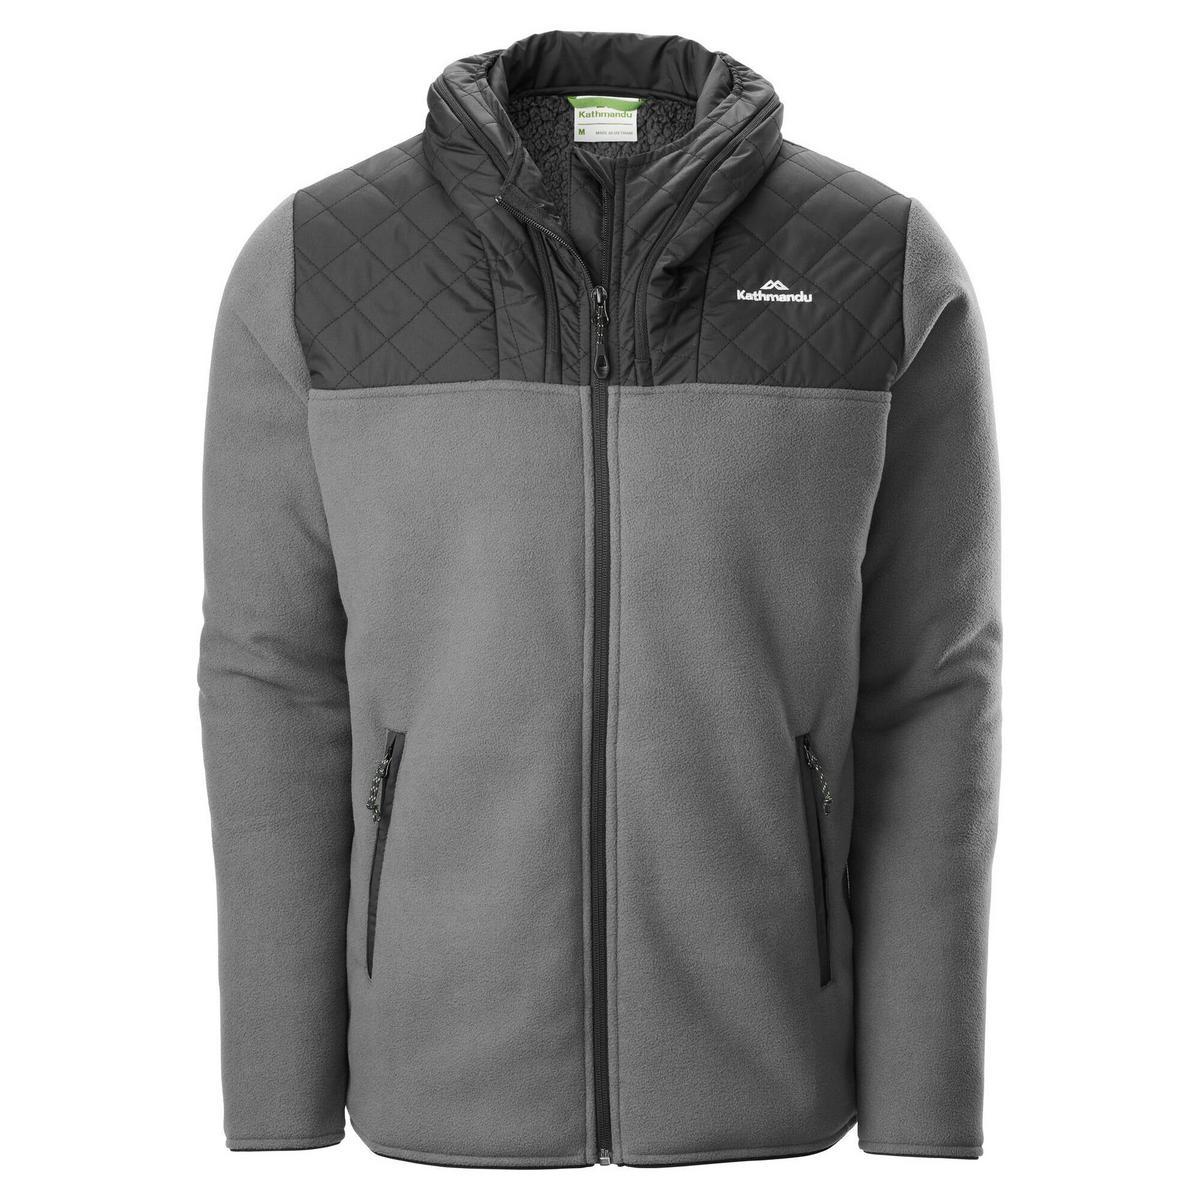 Kathmandu Men's Winterbrun Jacket - Grey